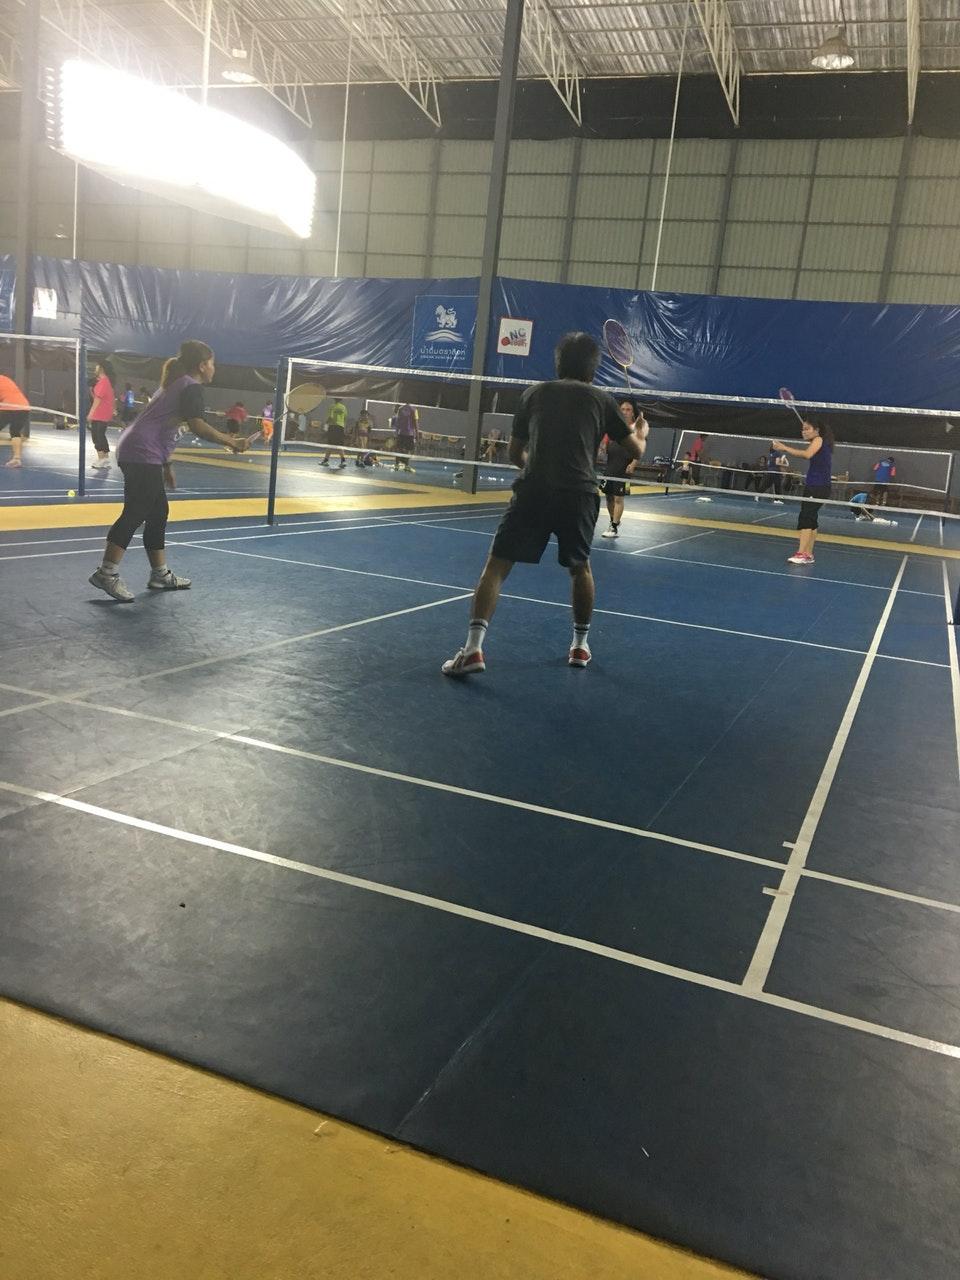 Nc court แบดมินตัน